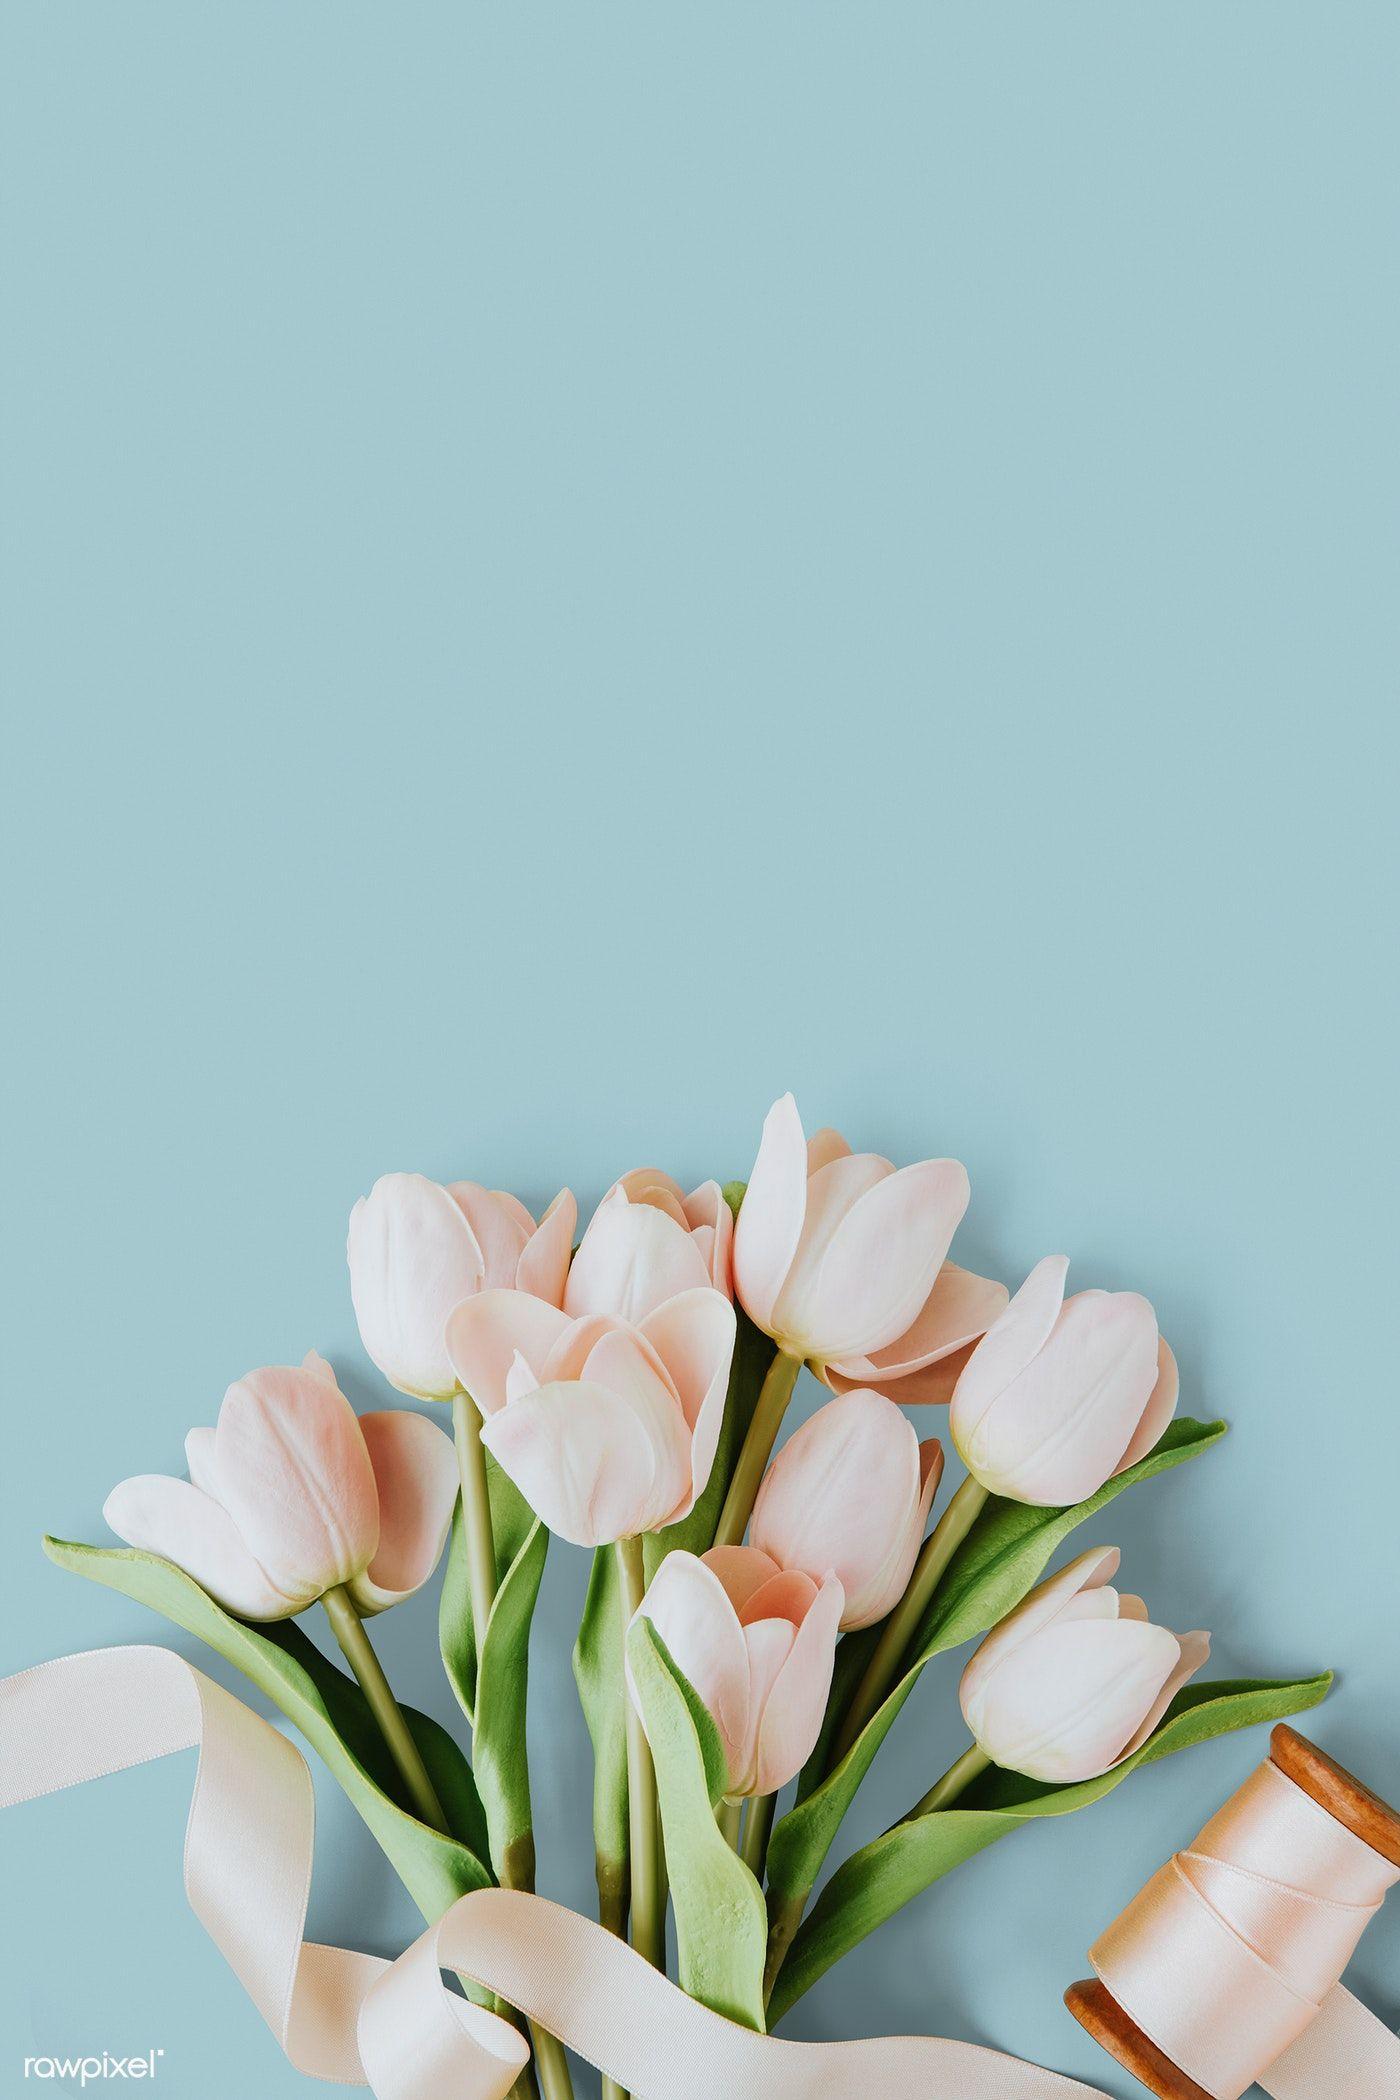 Download Premium Psd Of Pink Tulip On Blank Blue Background Template ดอกไม วอลเปเปอร ภาพ